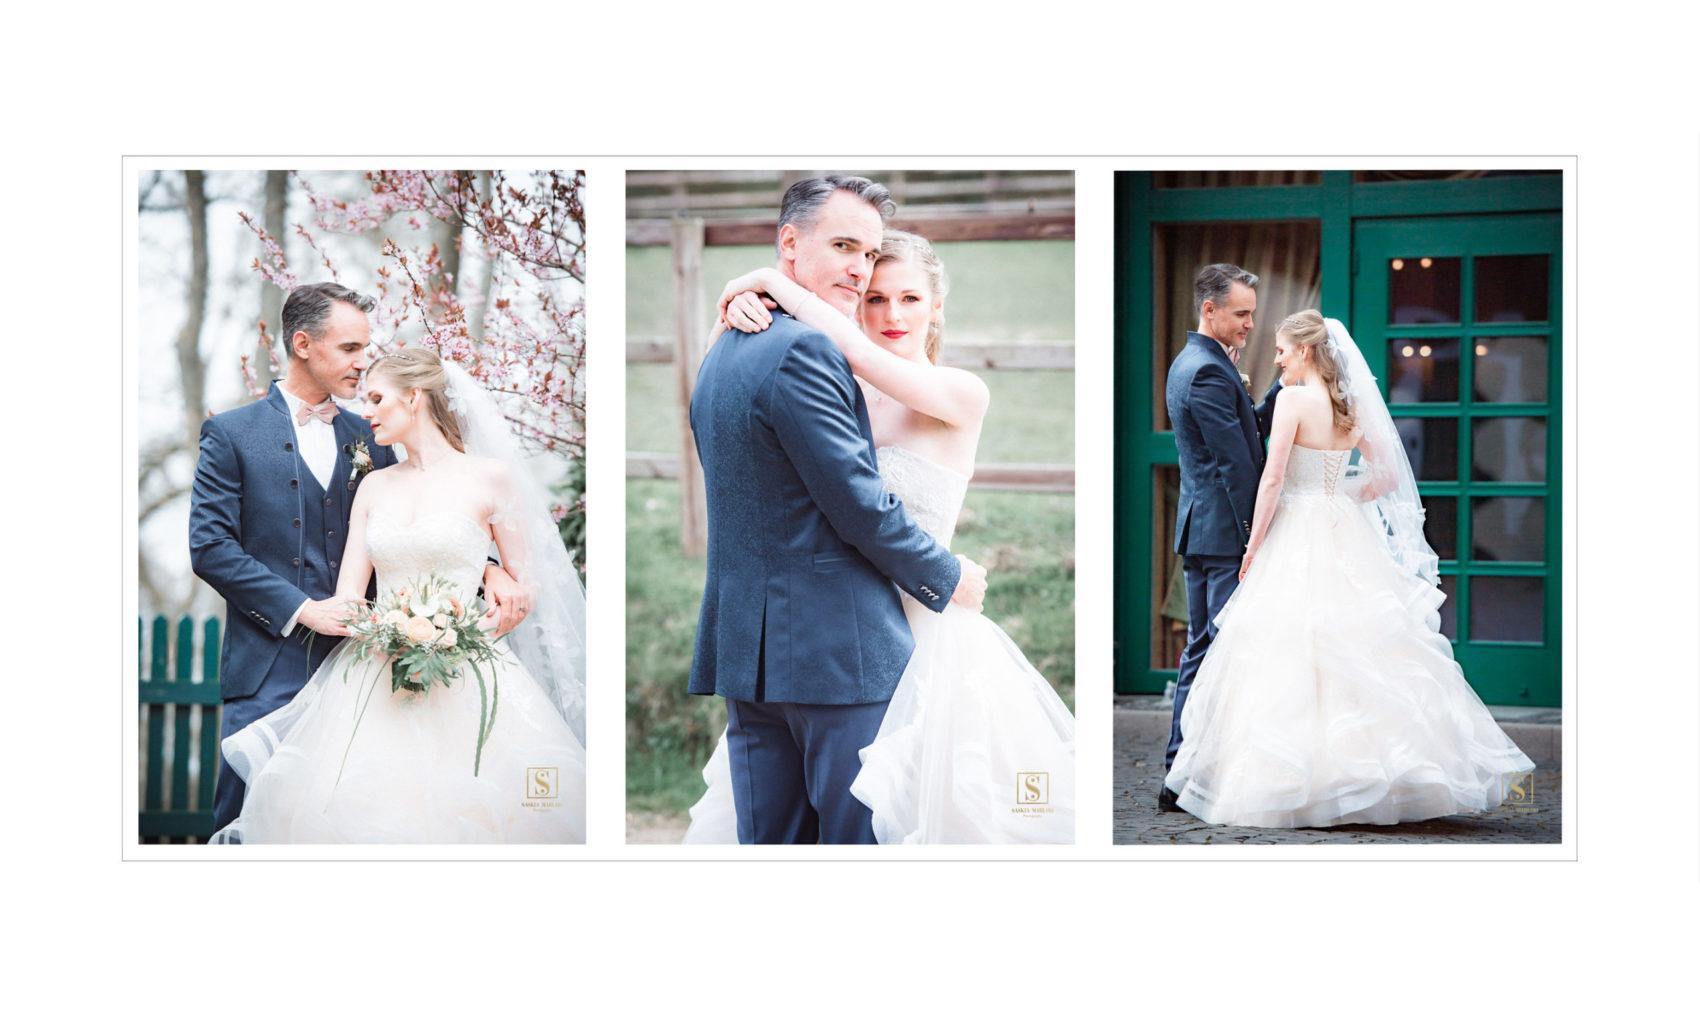 Hofgut-Mappen-Wedding-Hochzeitsfotograf-Saskia-Marloh-Photography-Johannisberg-Abu-Dhabi